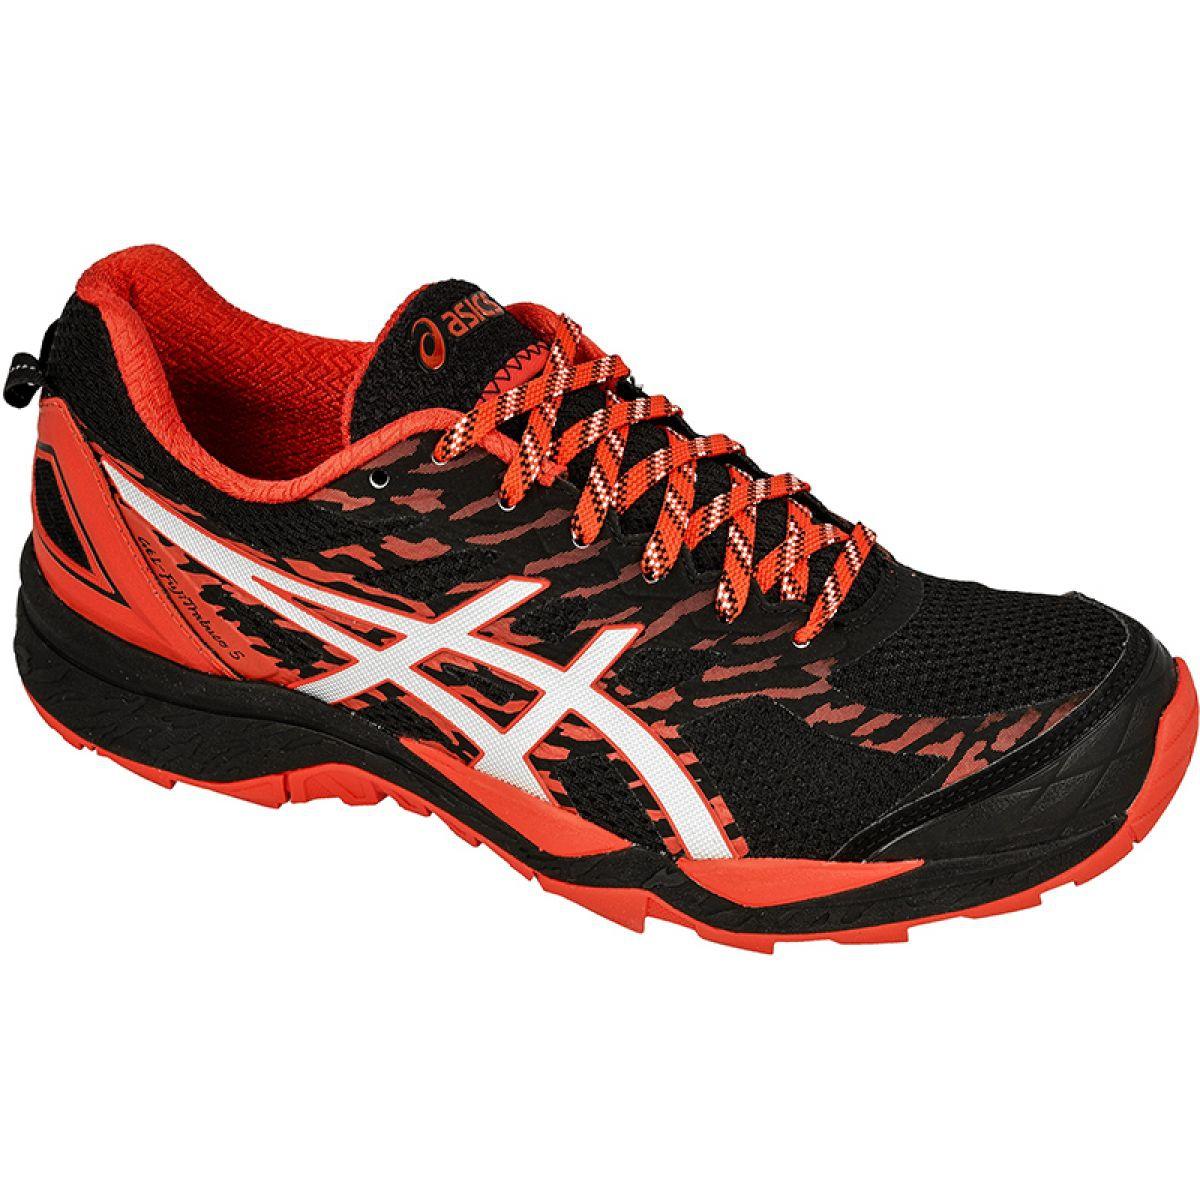 Running shoes Asics Gel-FujiTrabuco 5 M T6J0N-9023 black orange